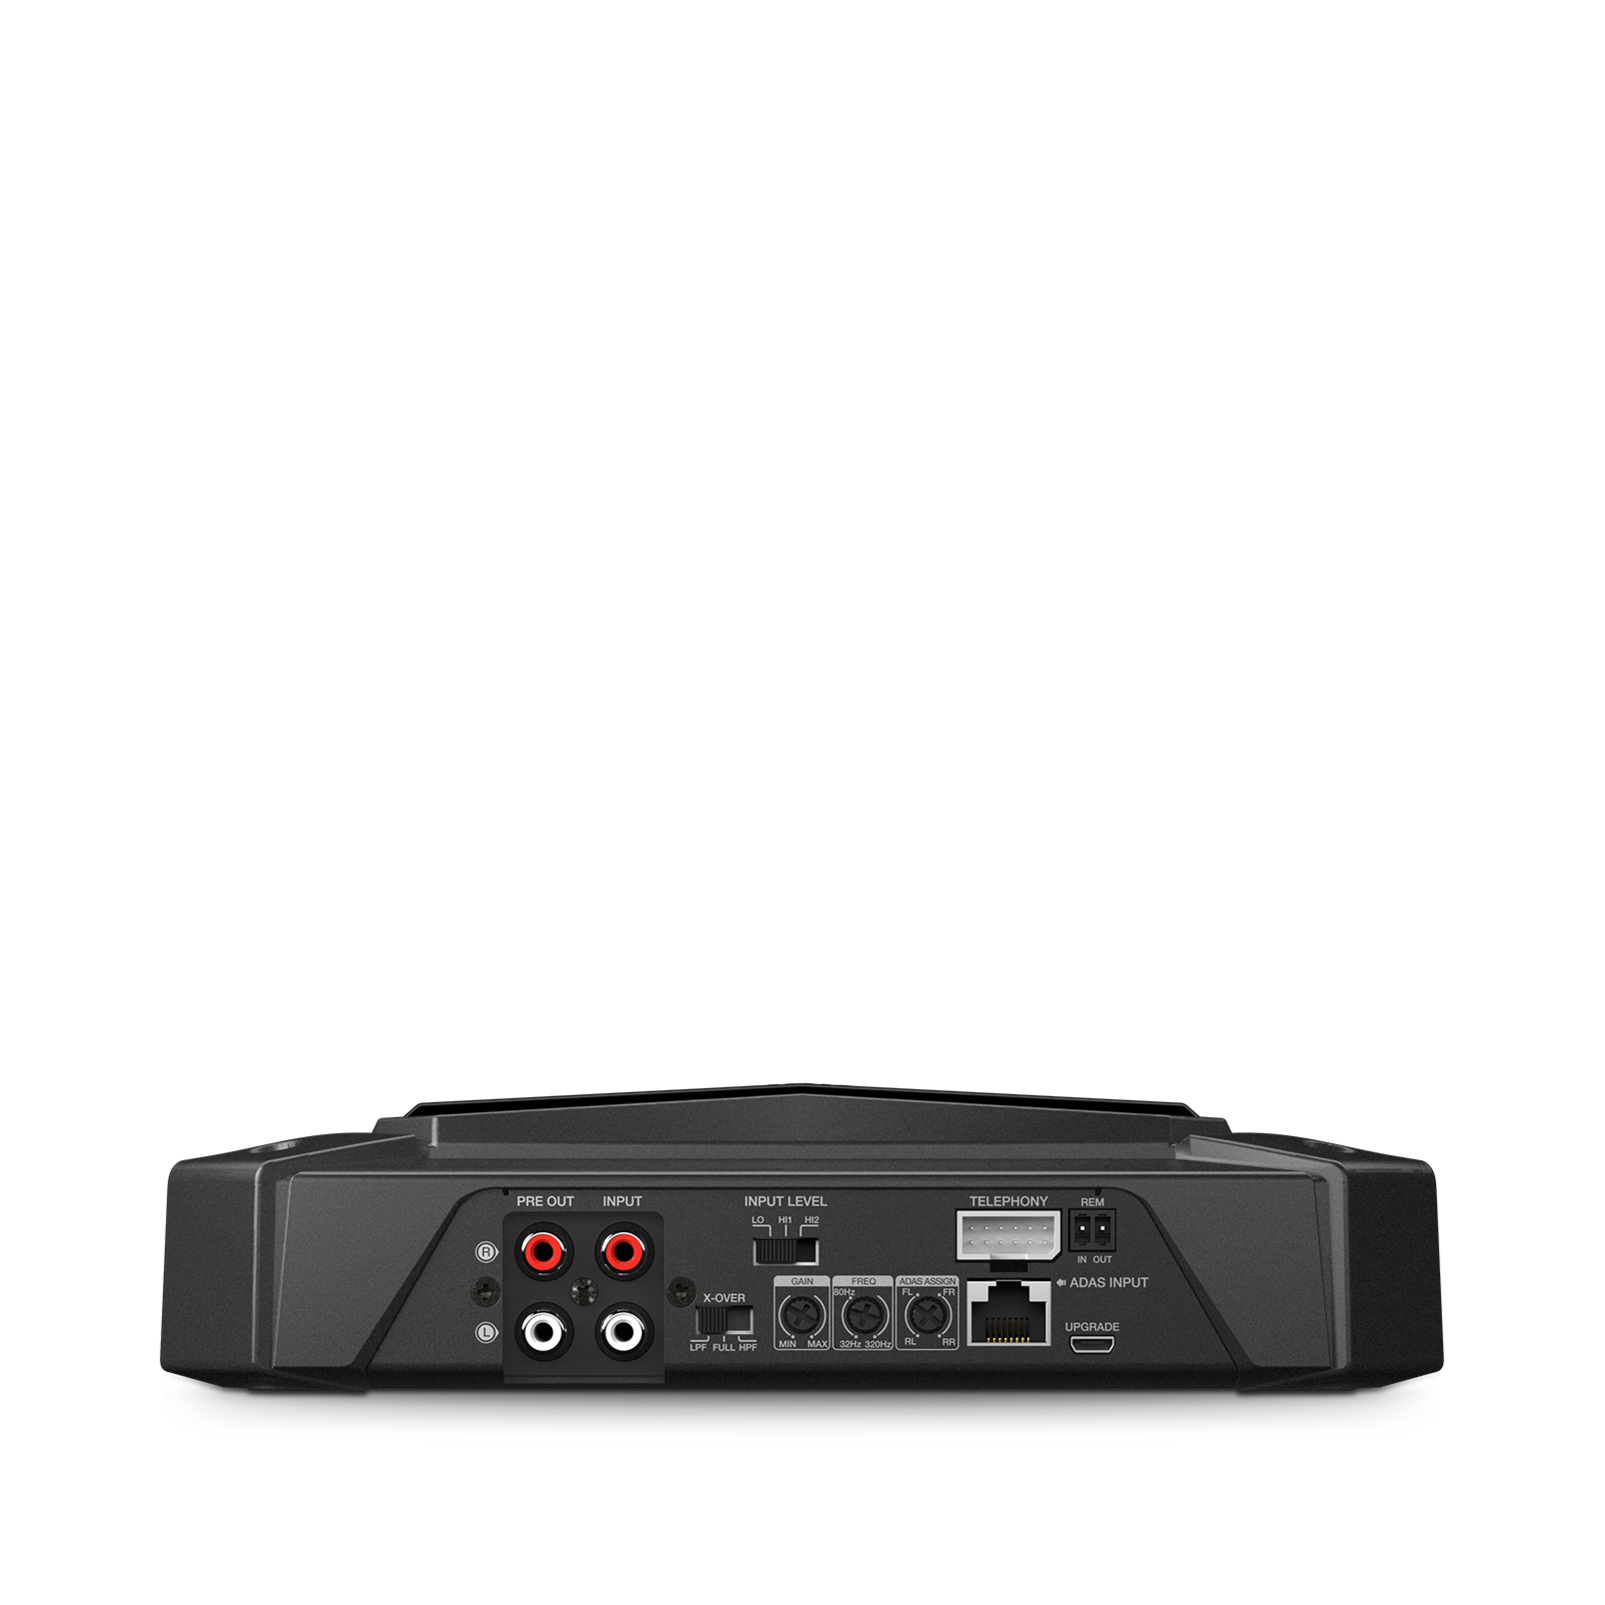 GTR-102 - Black - 2 Channel, 700W High Performance Car Amplifier - Detailshot 2